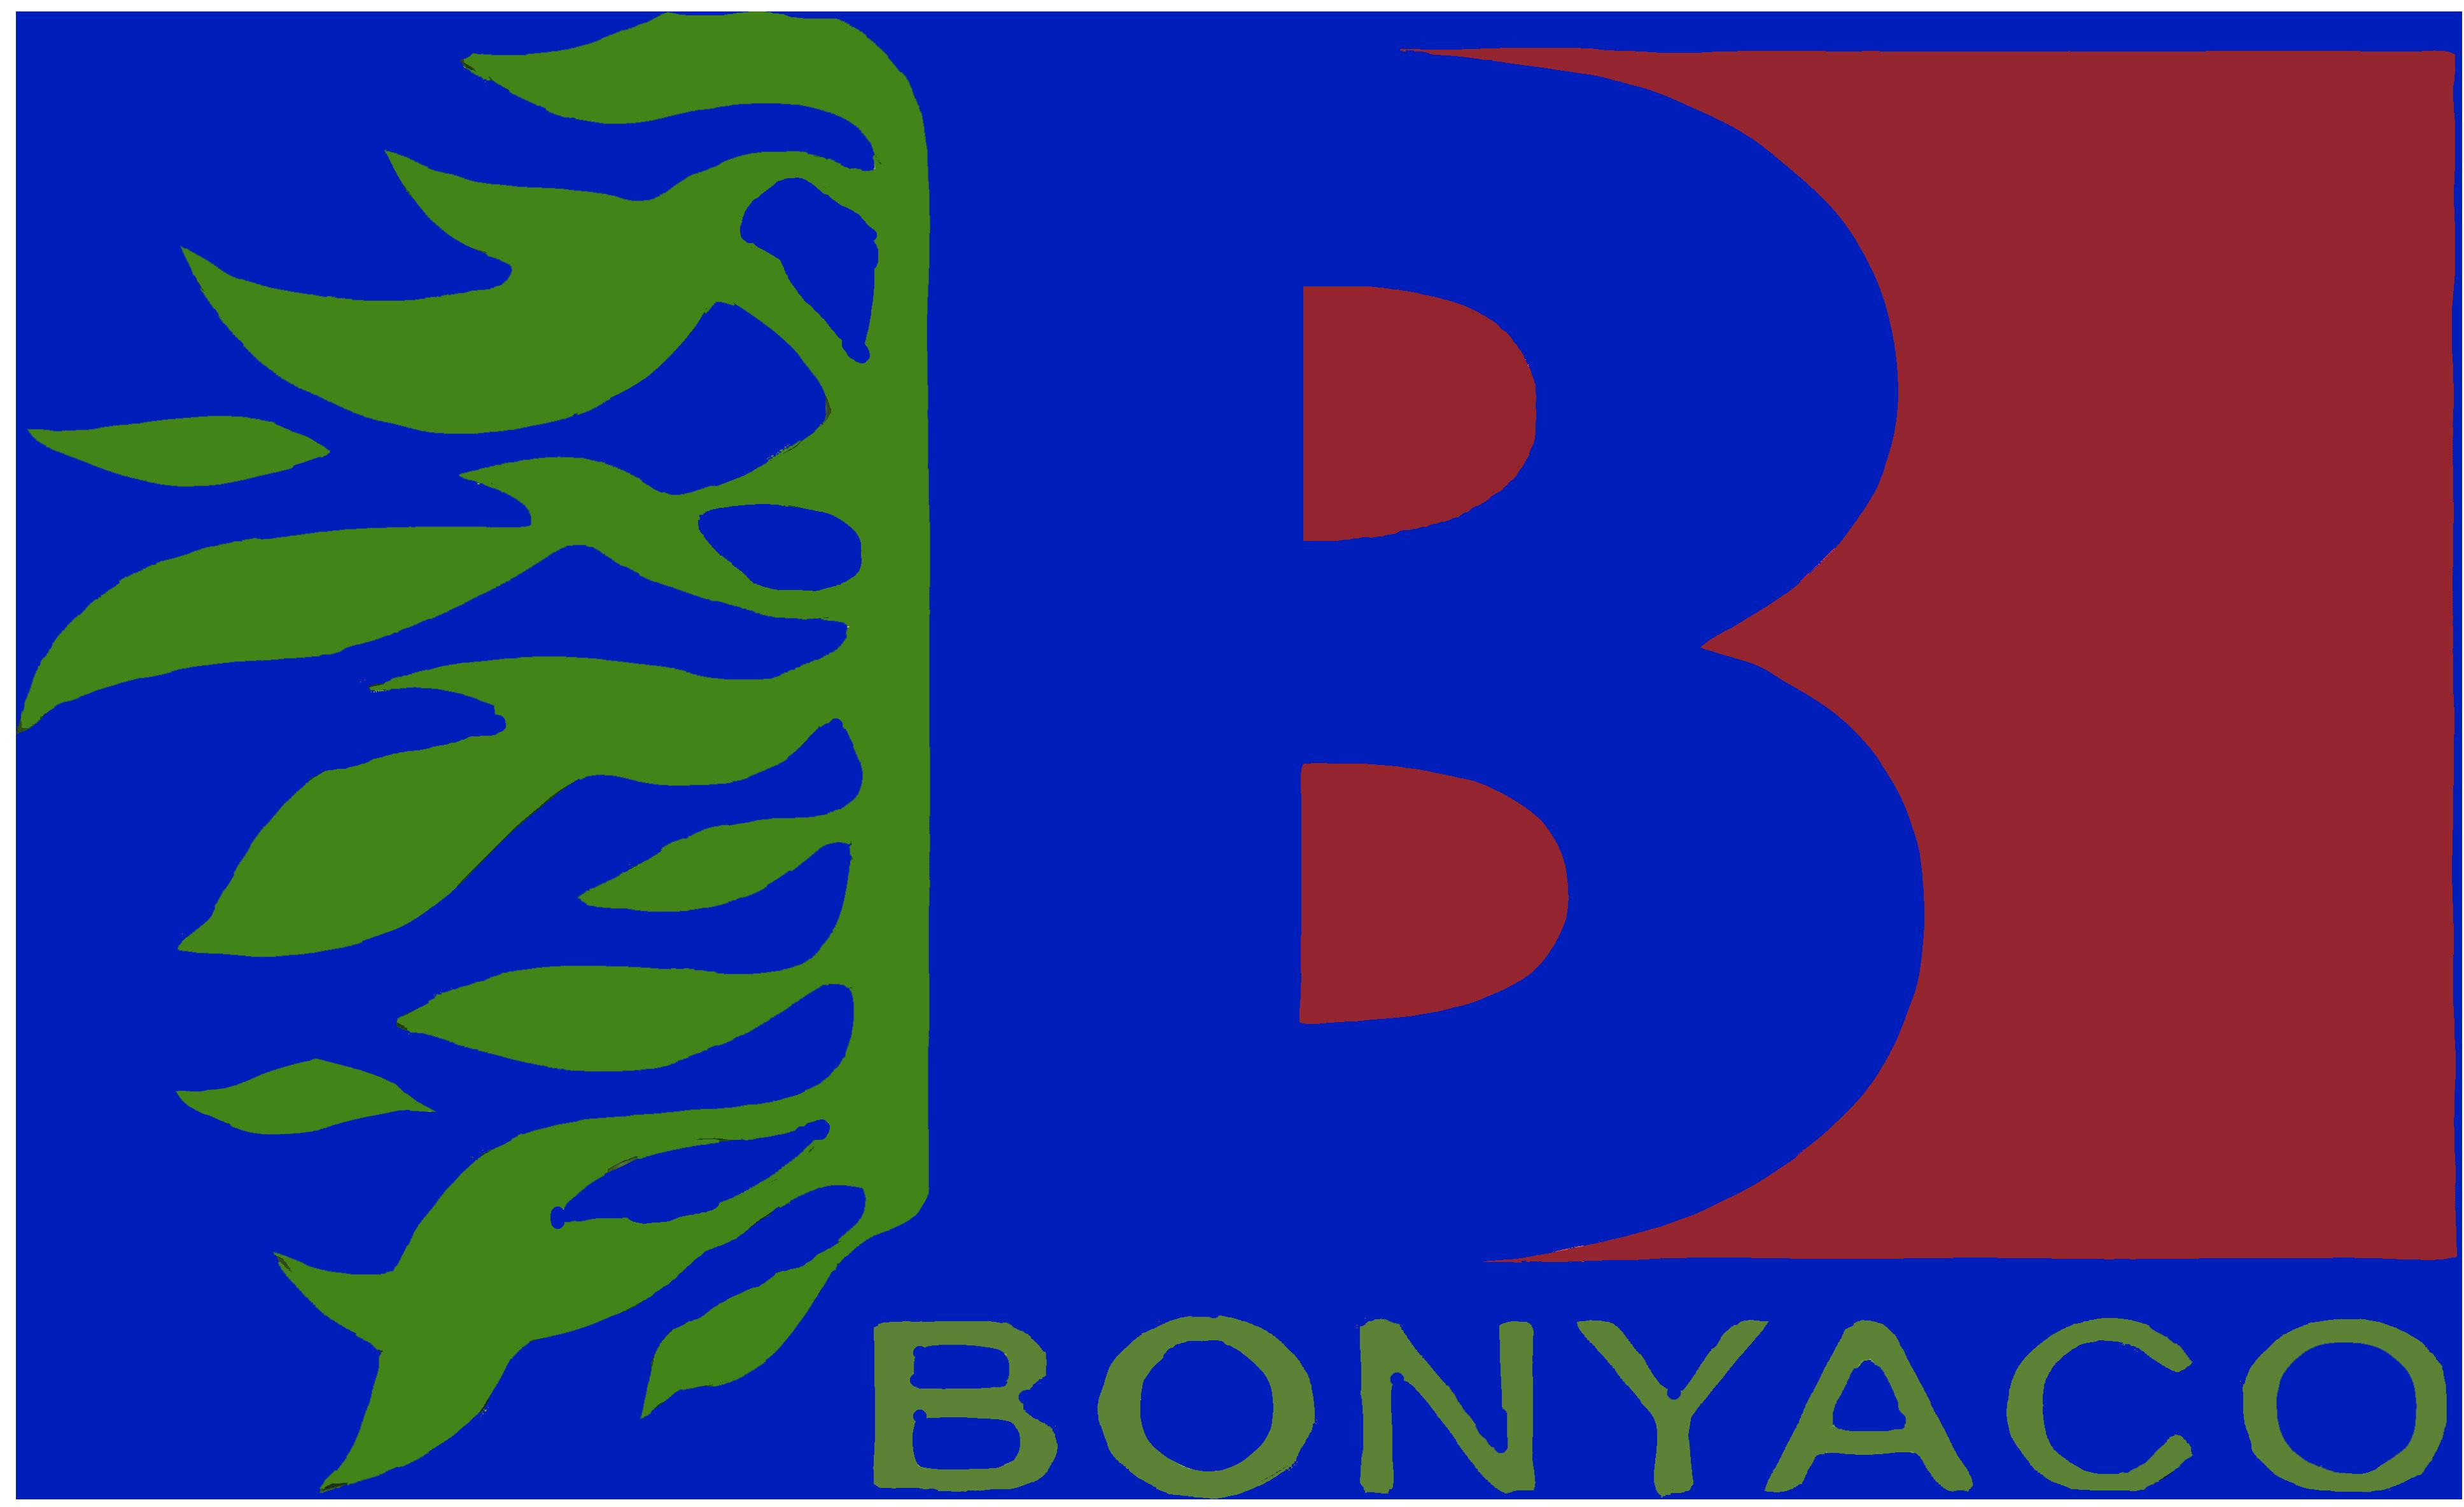 BONYACO